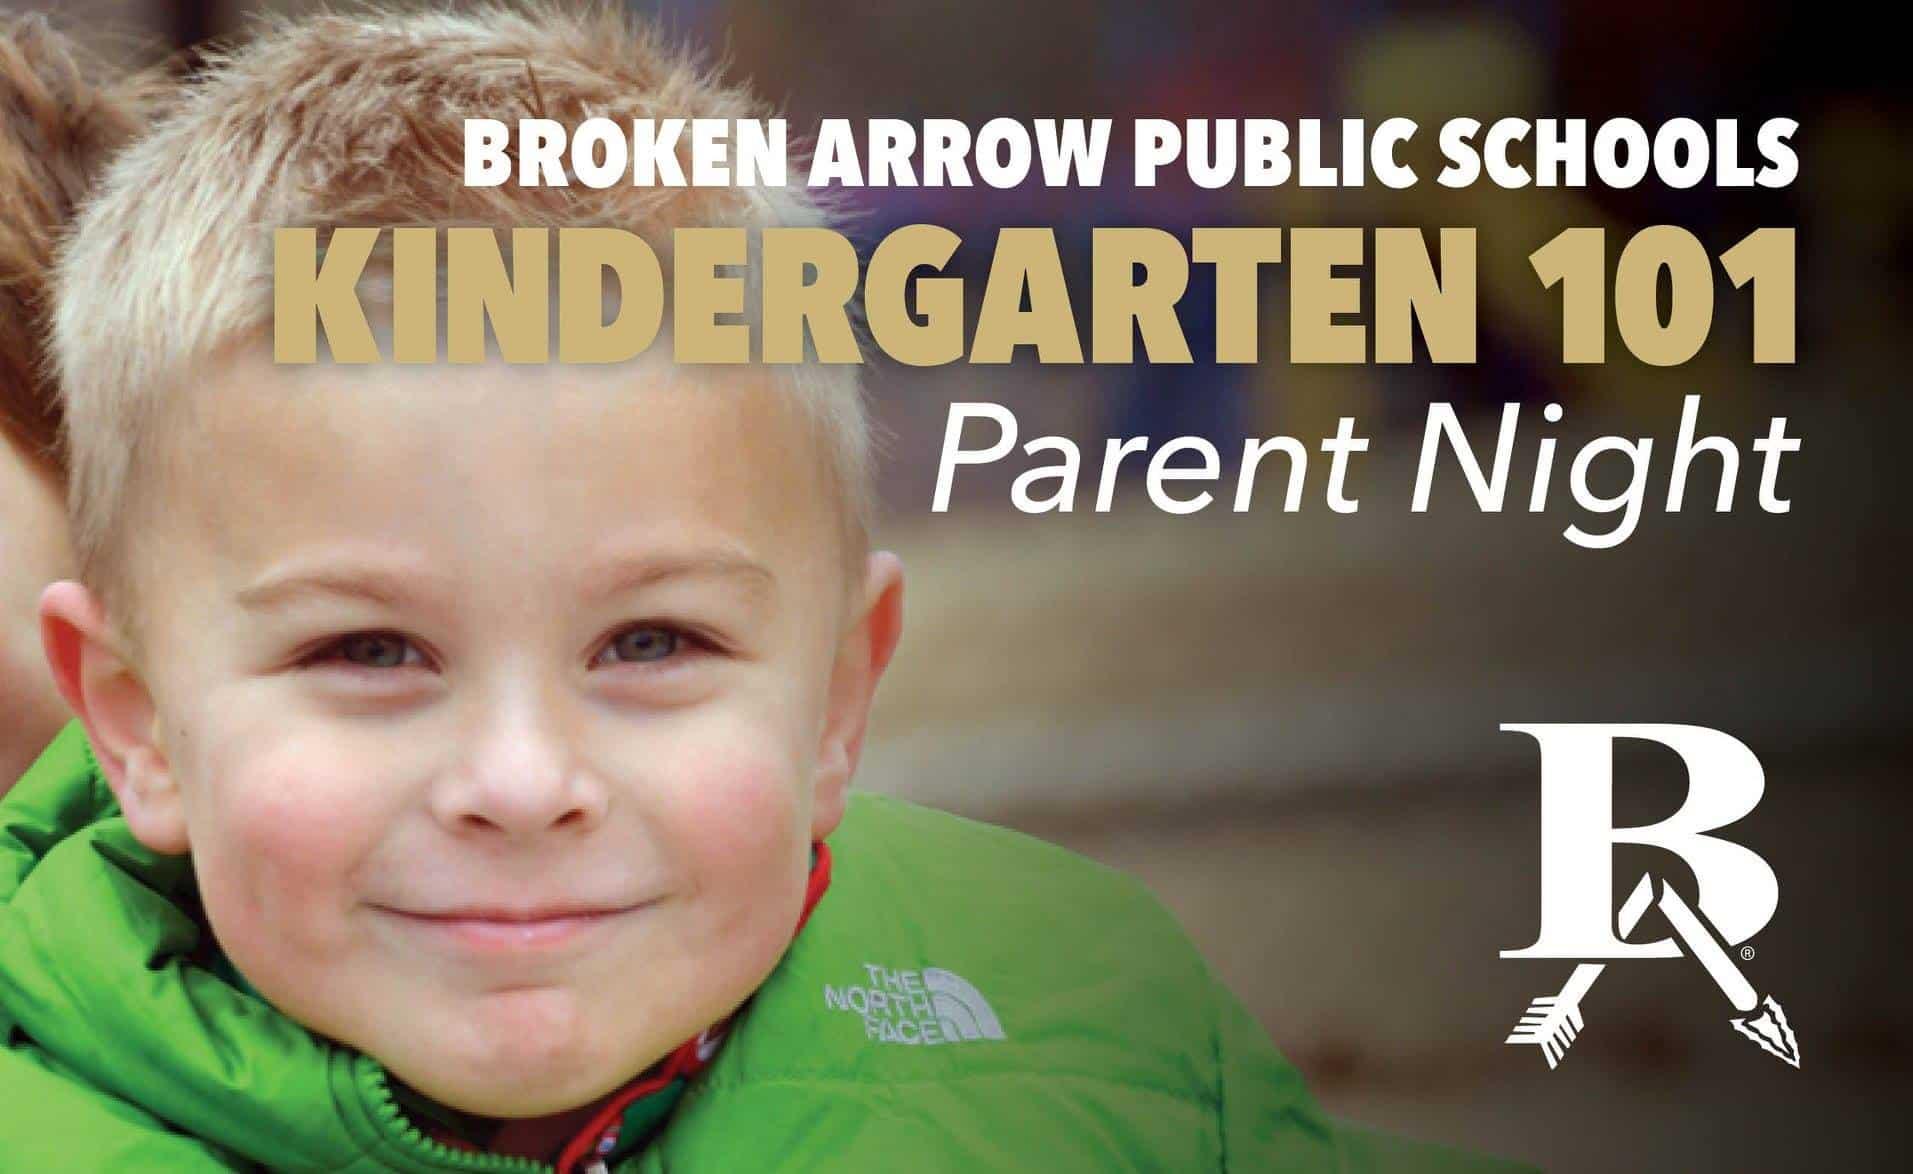 Kindergarten 101 May 8th!